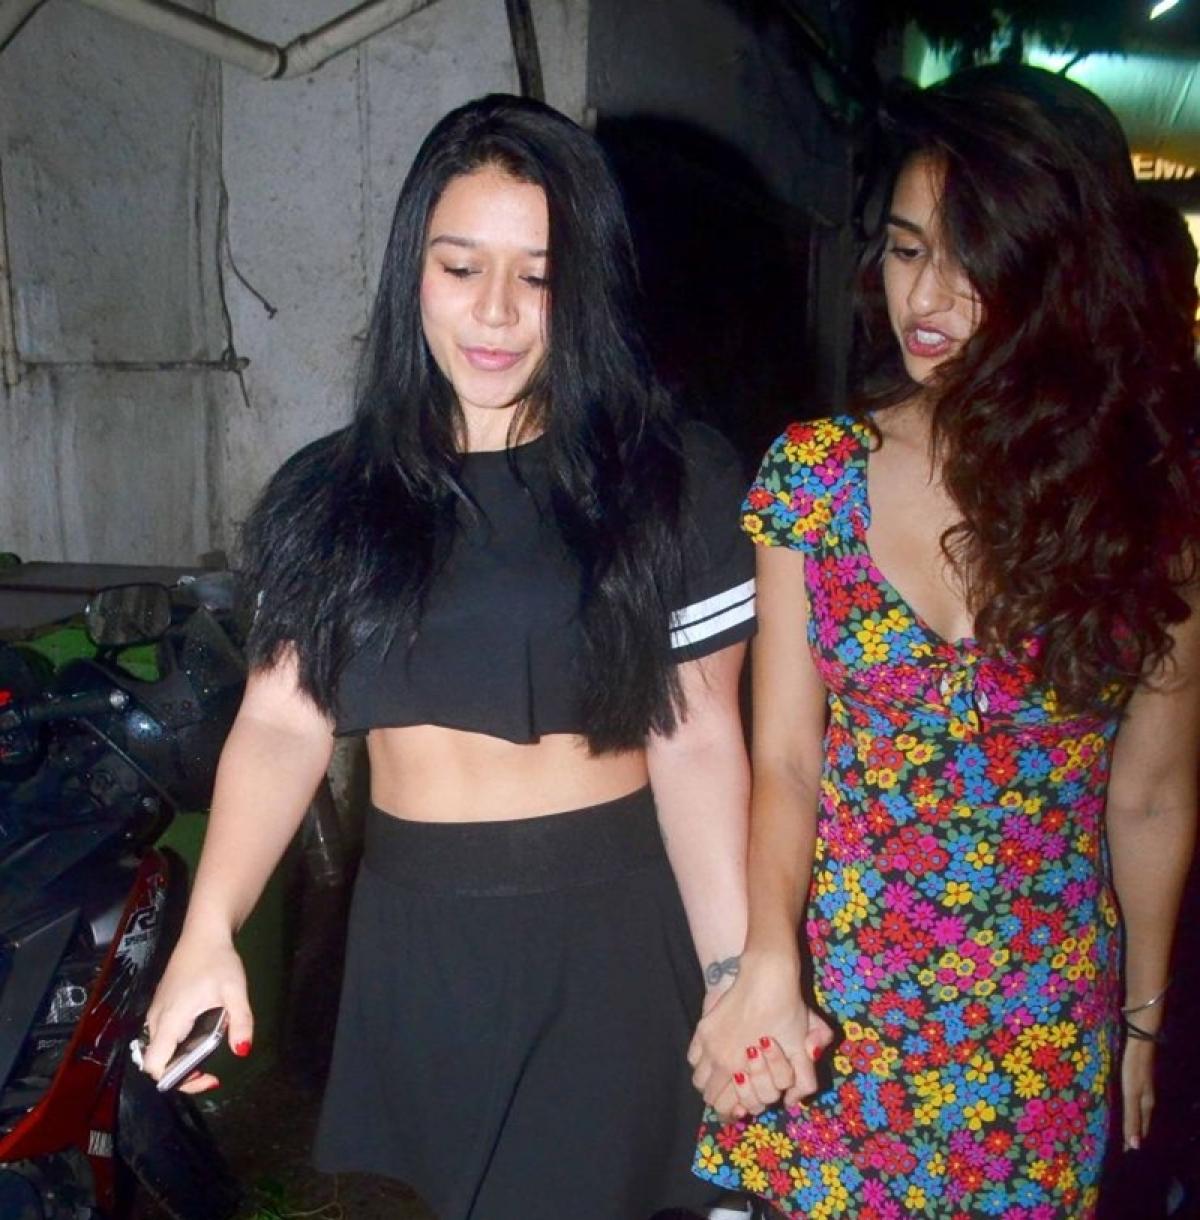 New BFFs of Bollywood: Tiger Shroff's alleged girlfriend Disha Patani and sister Krishna Shroff spotted together